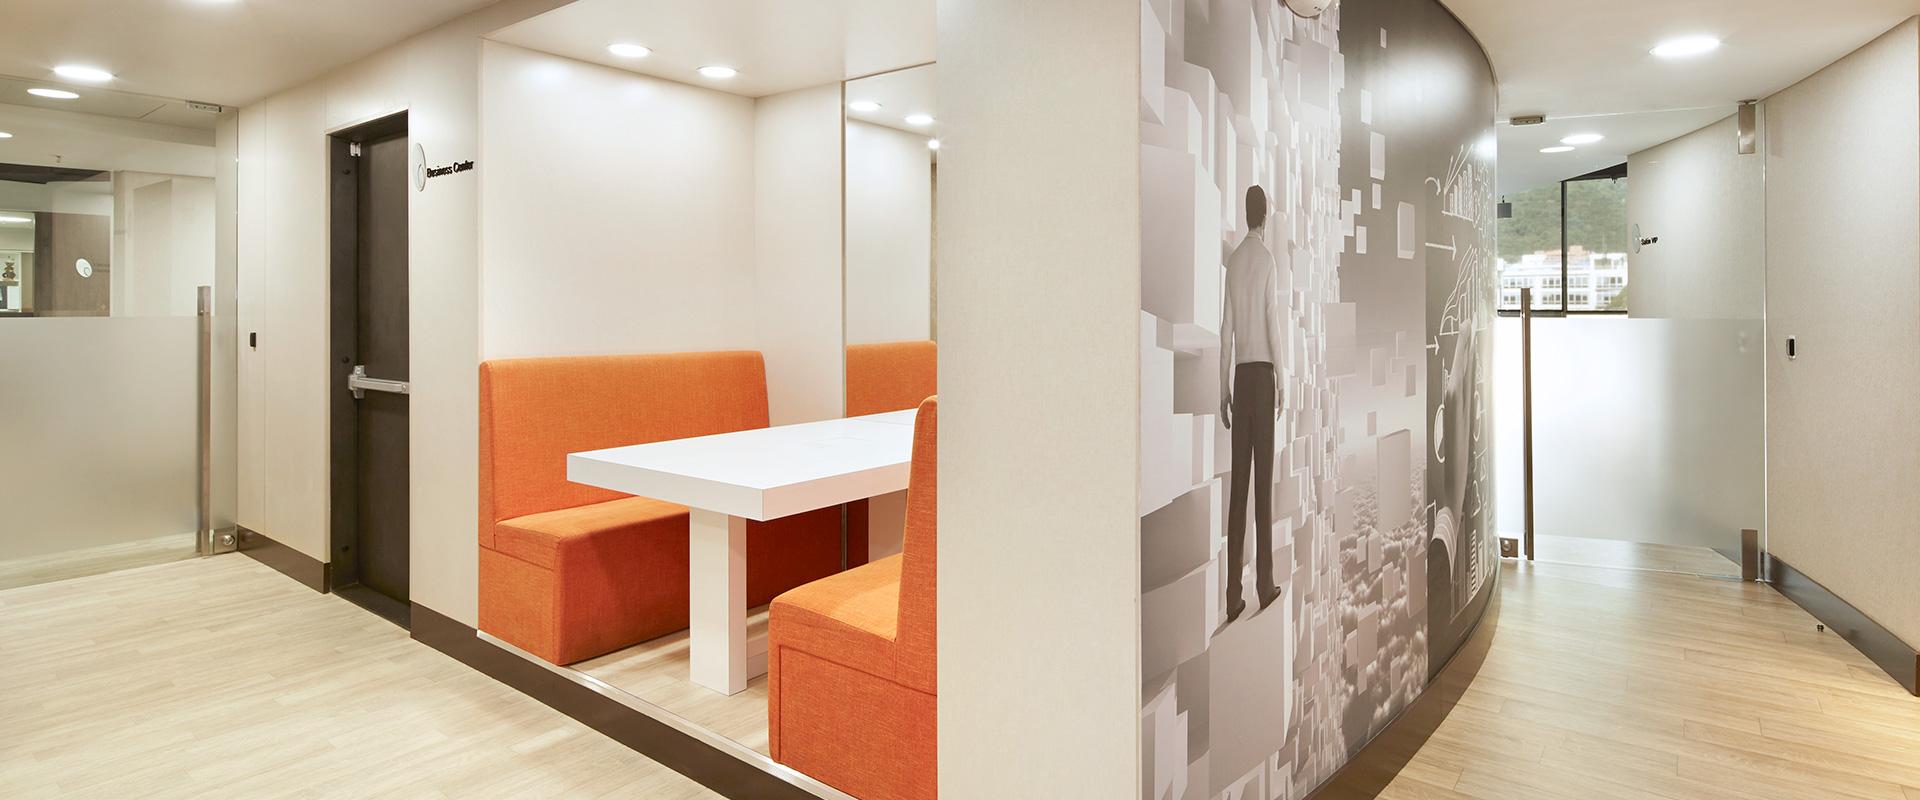 Dise O De Interiores Y Remodelaci N Oficina Acipent Bogot  # Muebles Nisi Bogota